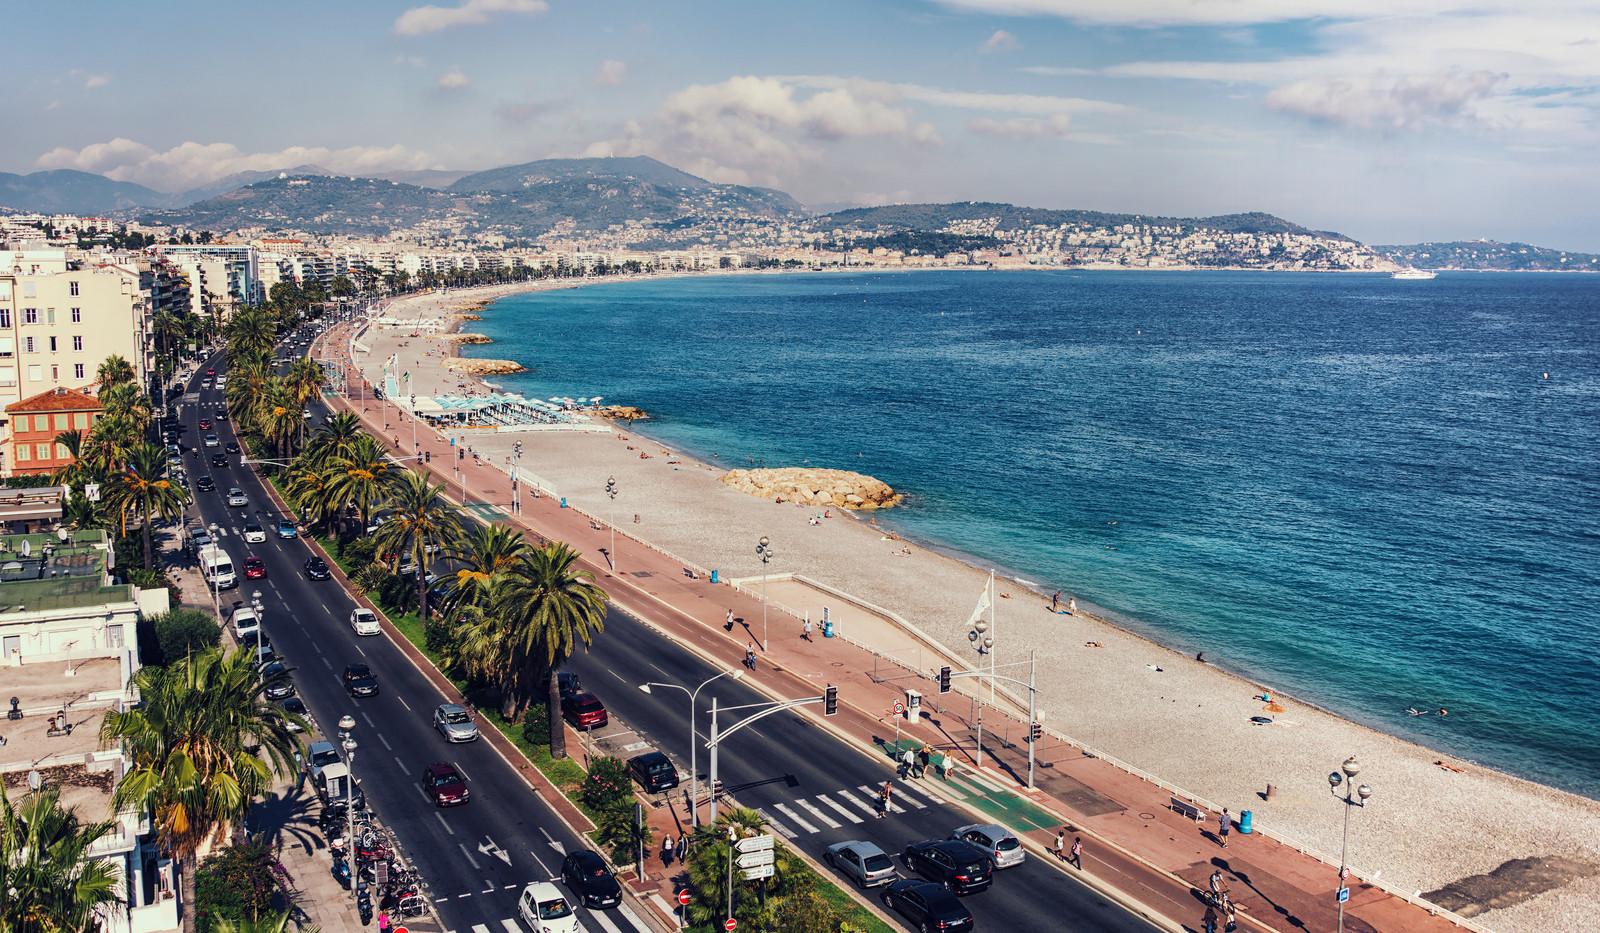 Canva - City of Nice in summer.jpg